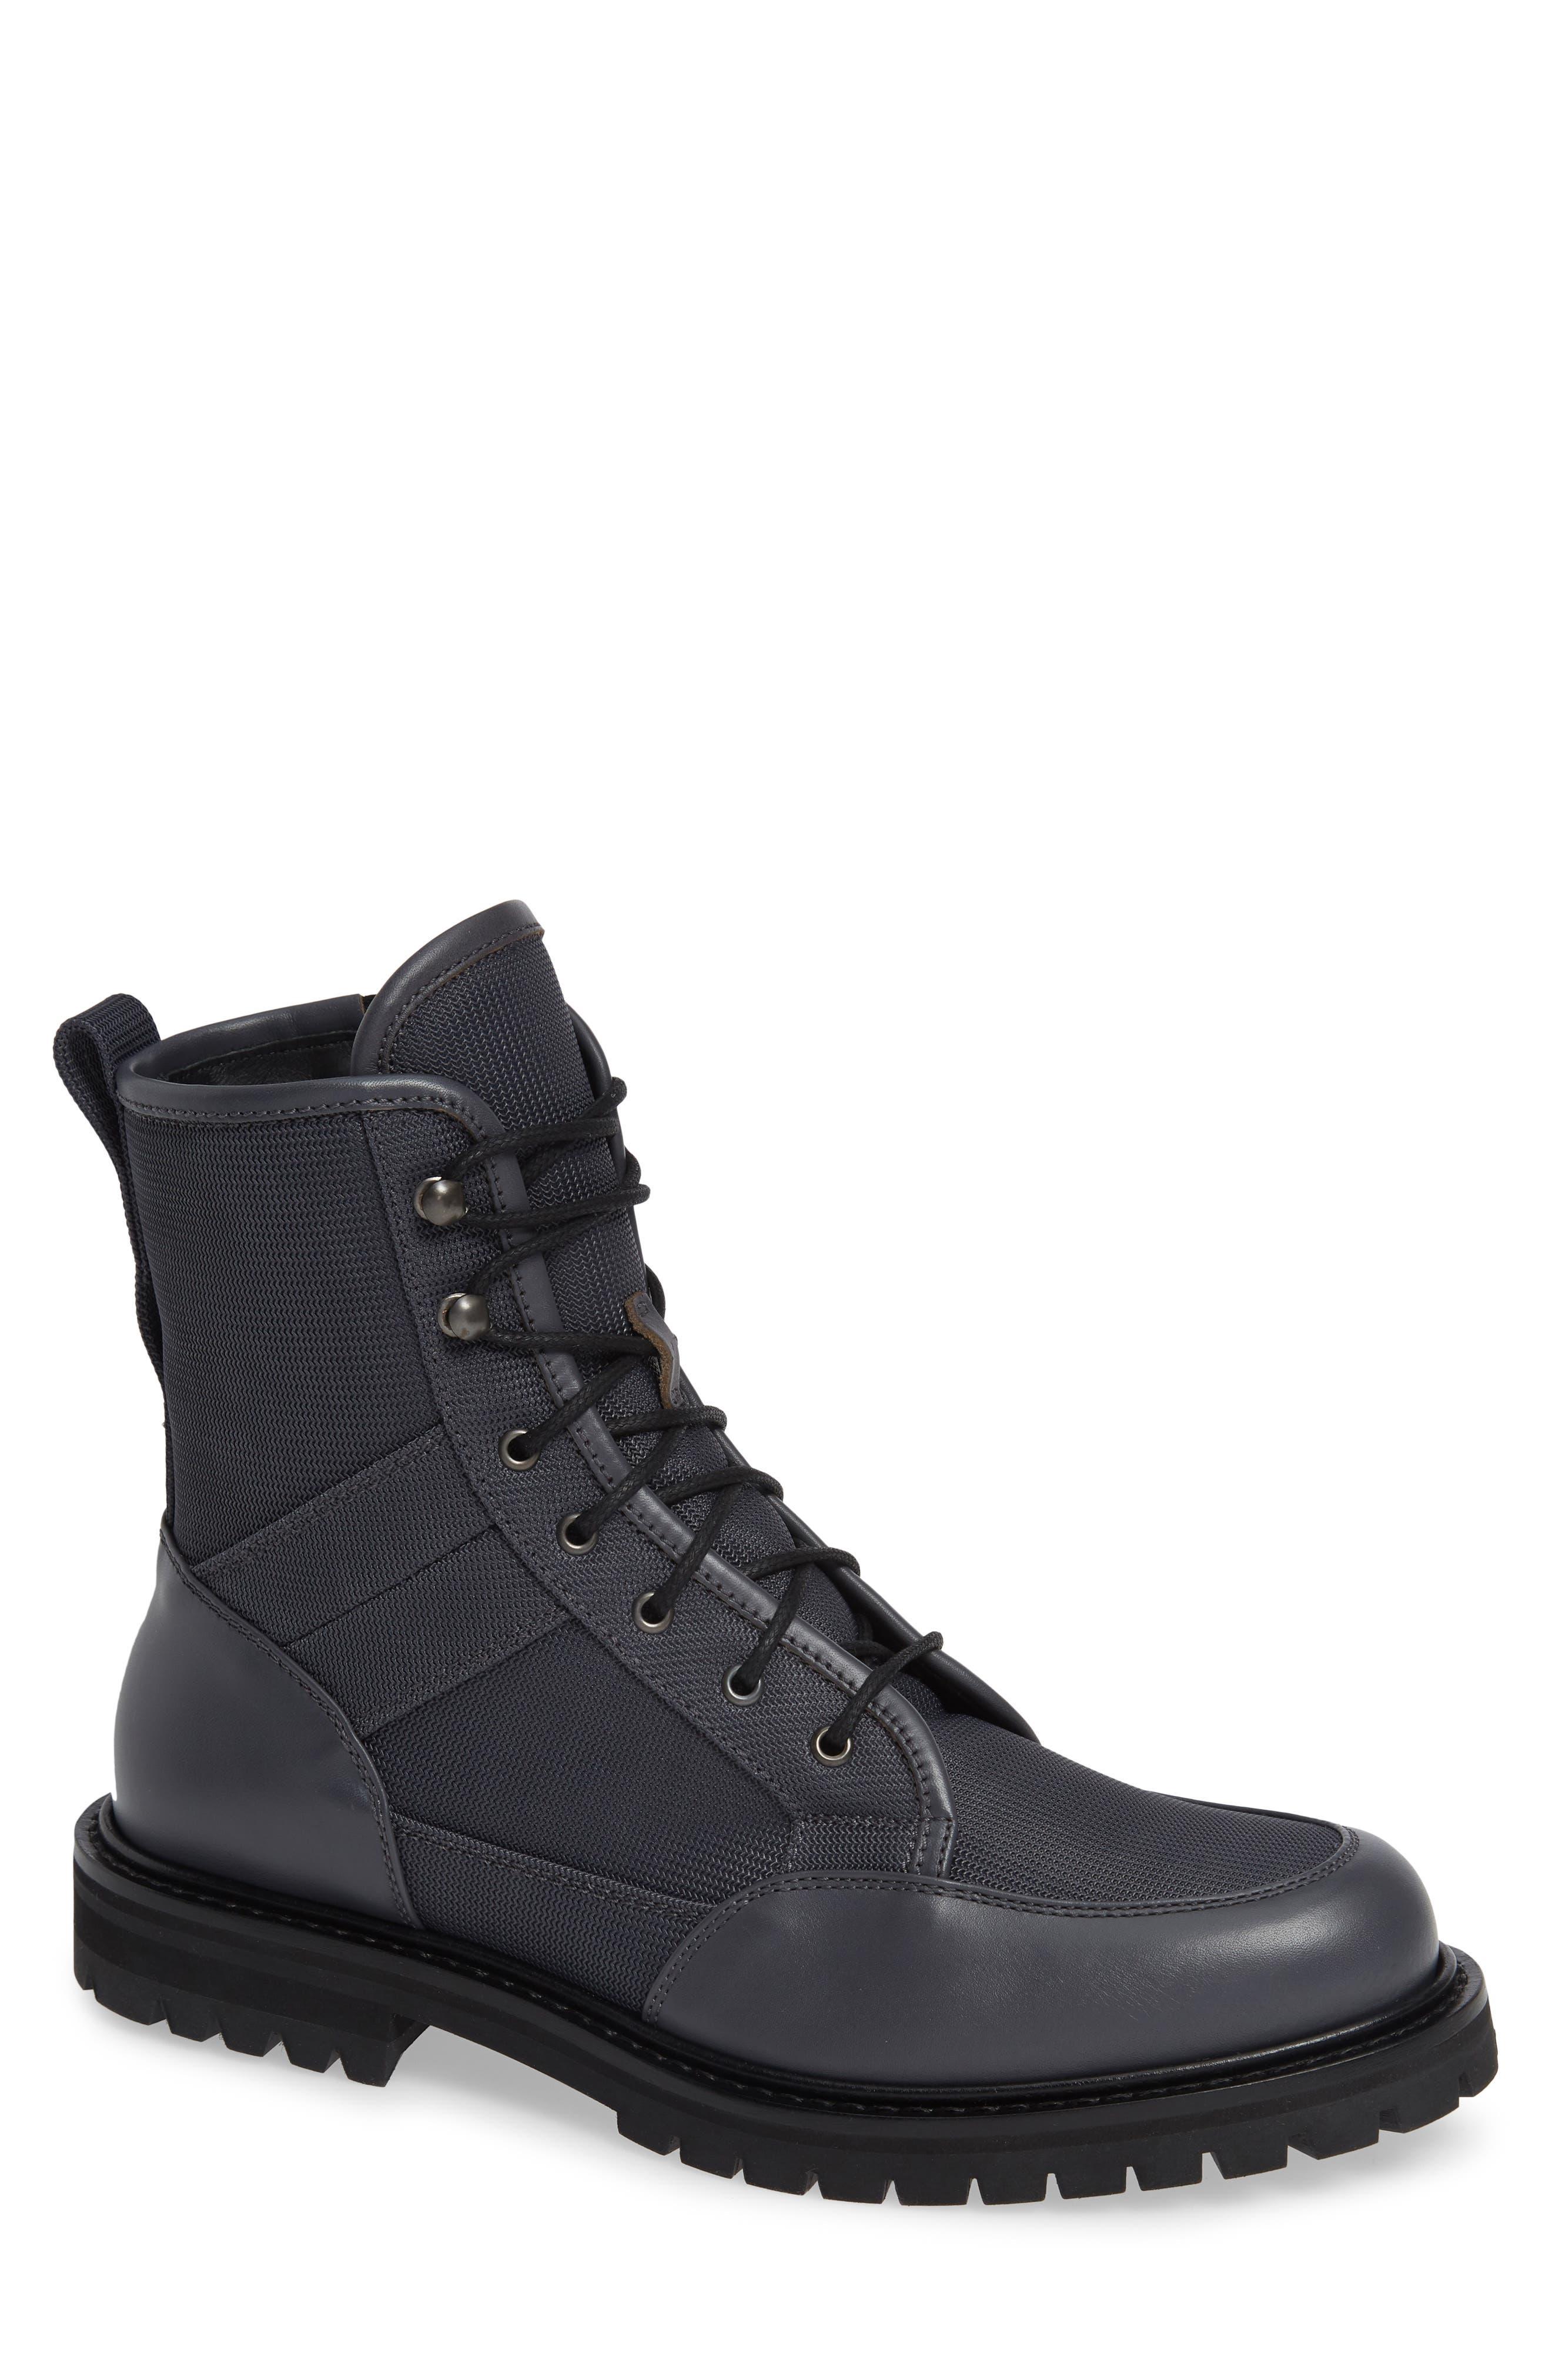 Aquatalia Irus Weatherproof Mesh Boot- Grey